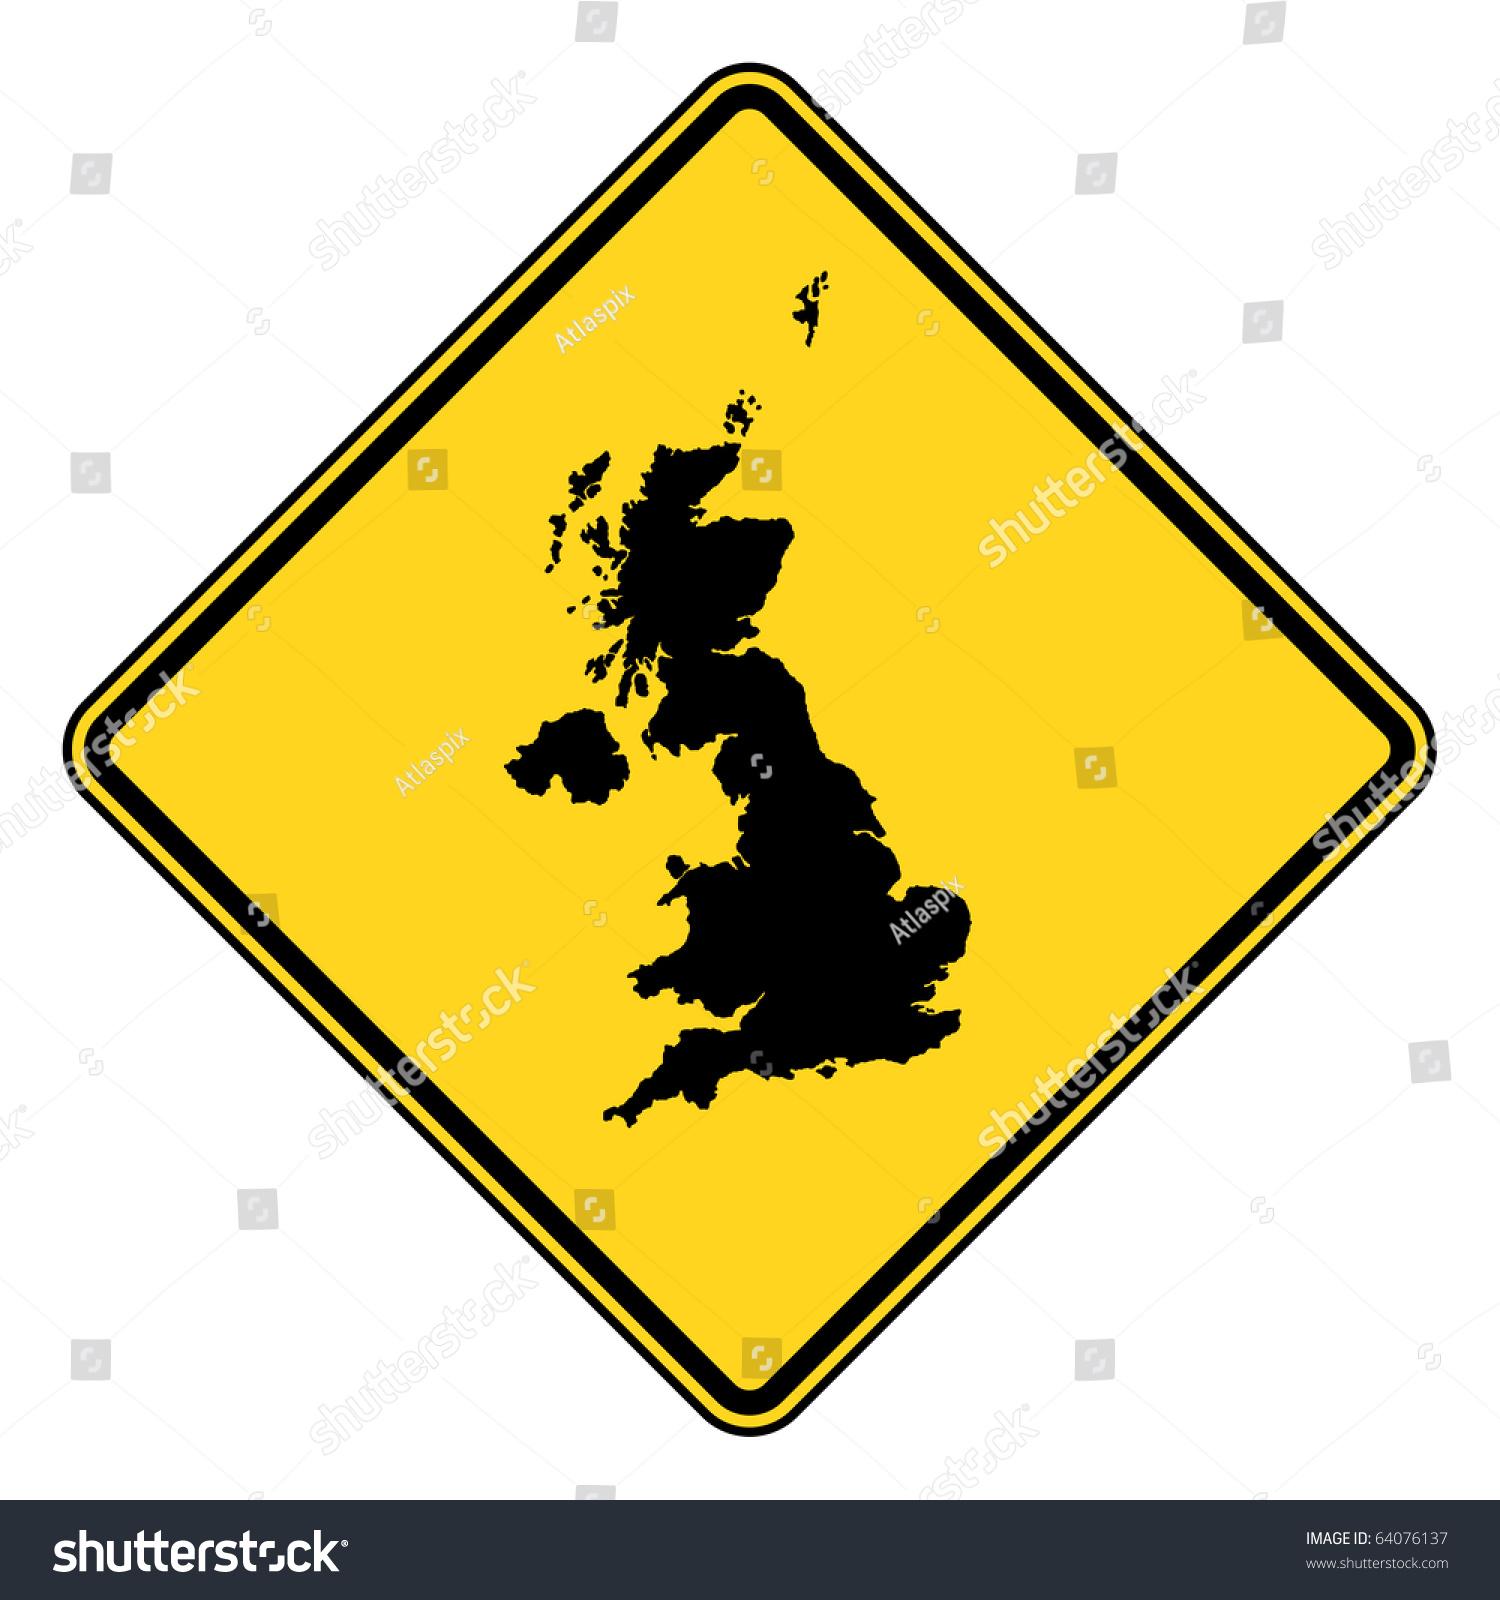 United Kingdom Yellow Diamond Shaped Road Stock ...